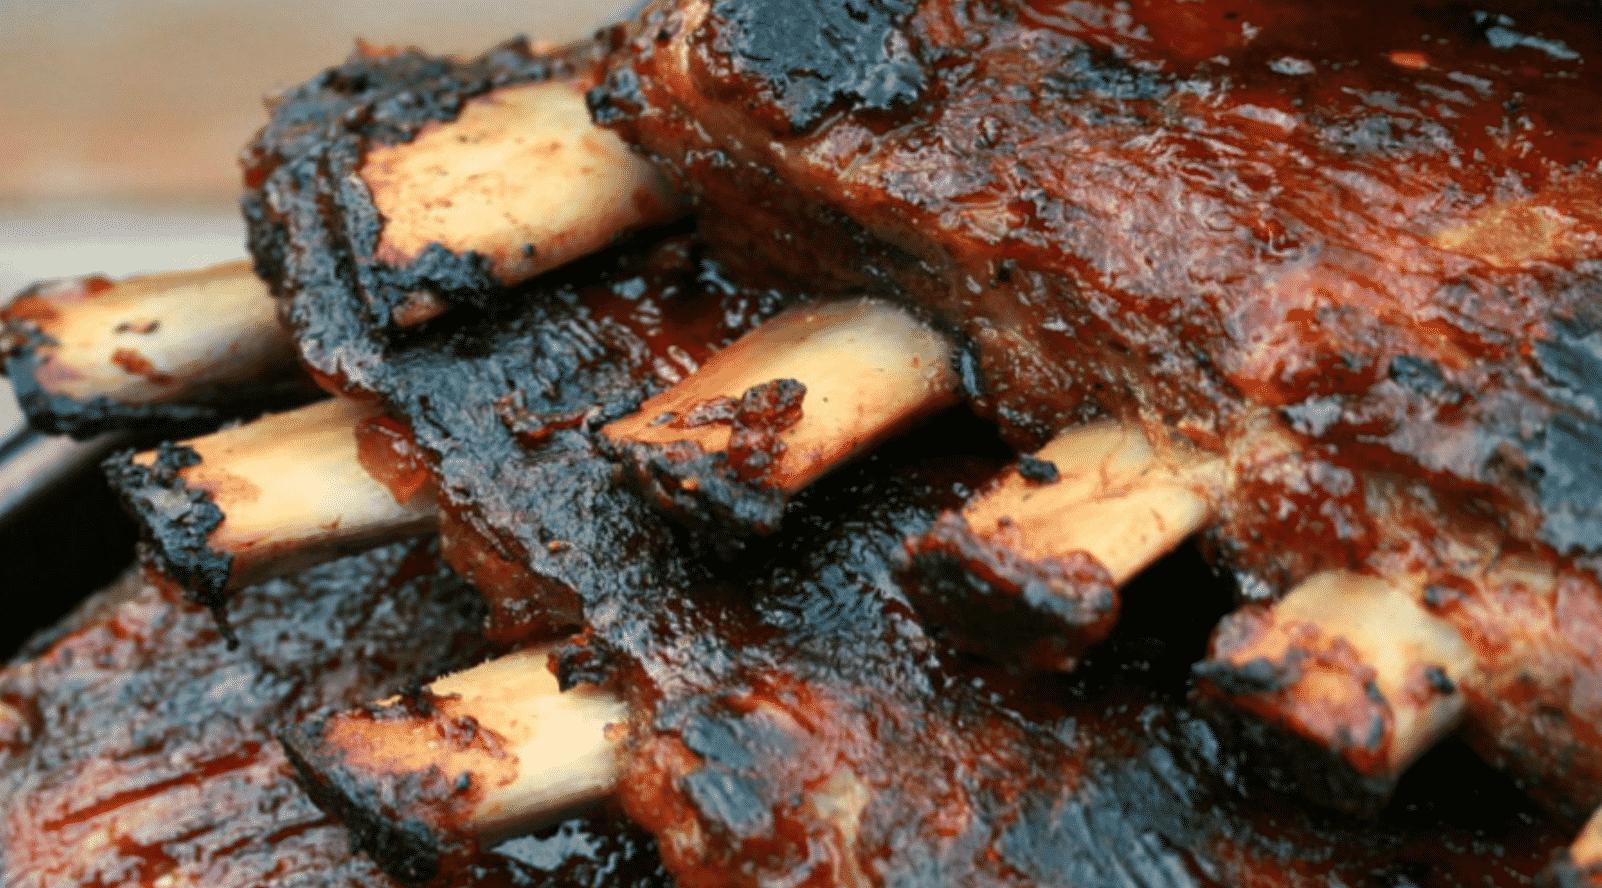 New Jersey ribs